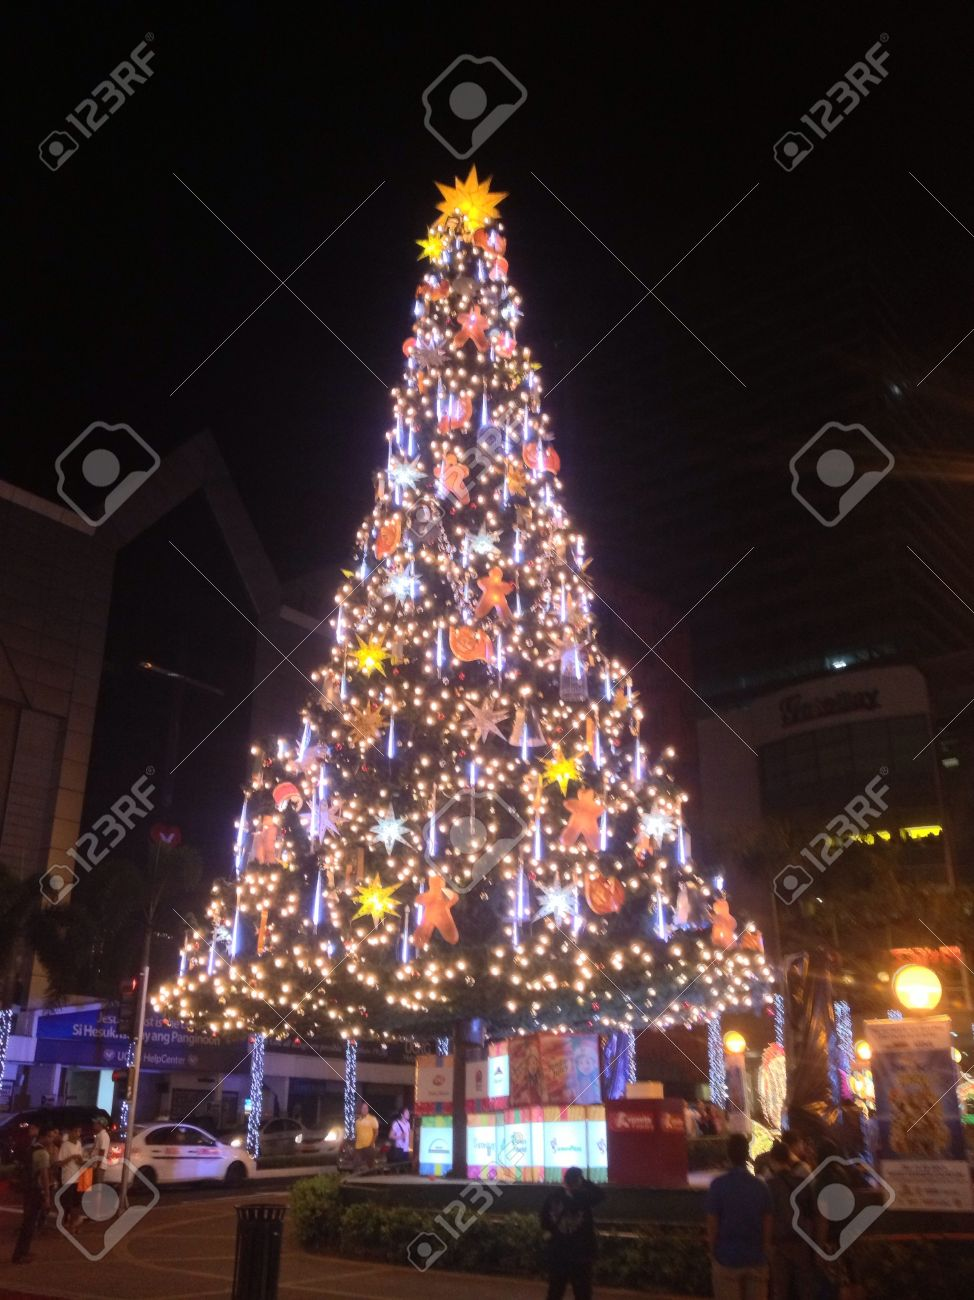 Ordinary Big Christmas Trees Part - 6: Big Christmas Tree Decorated With Lights Stock Photo - 23962926